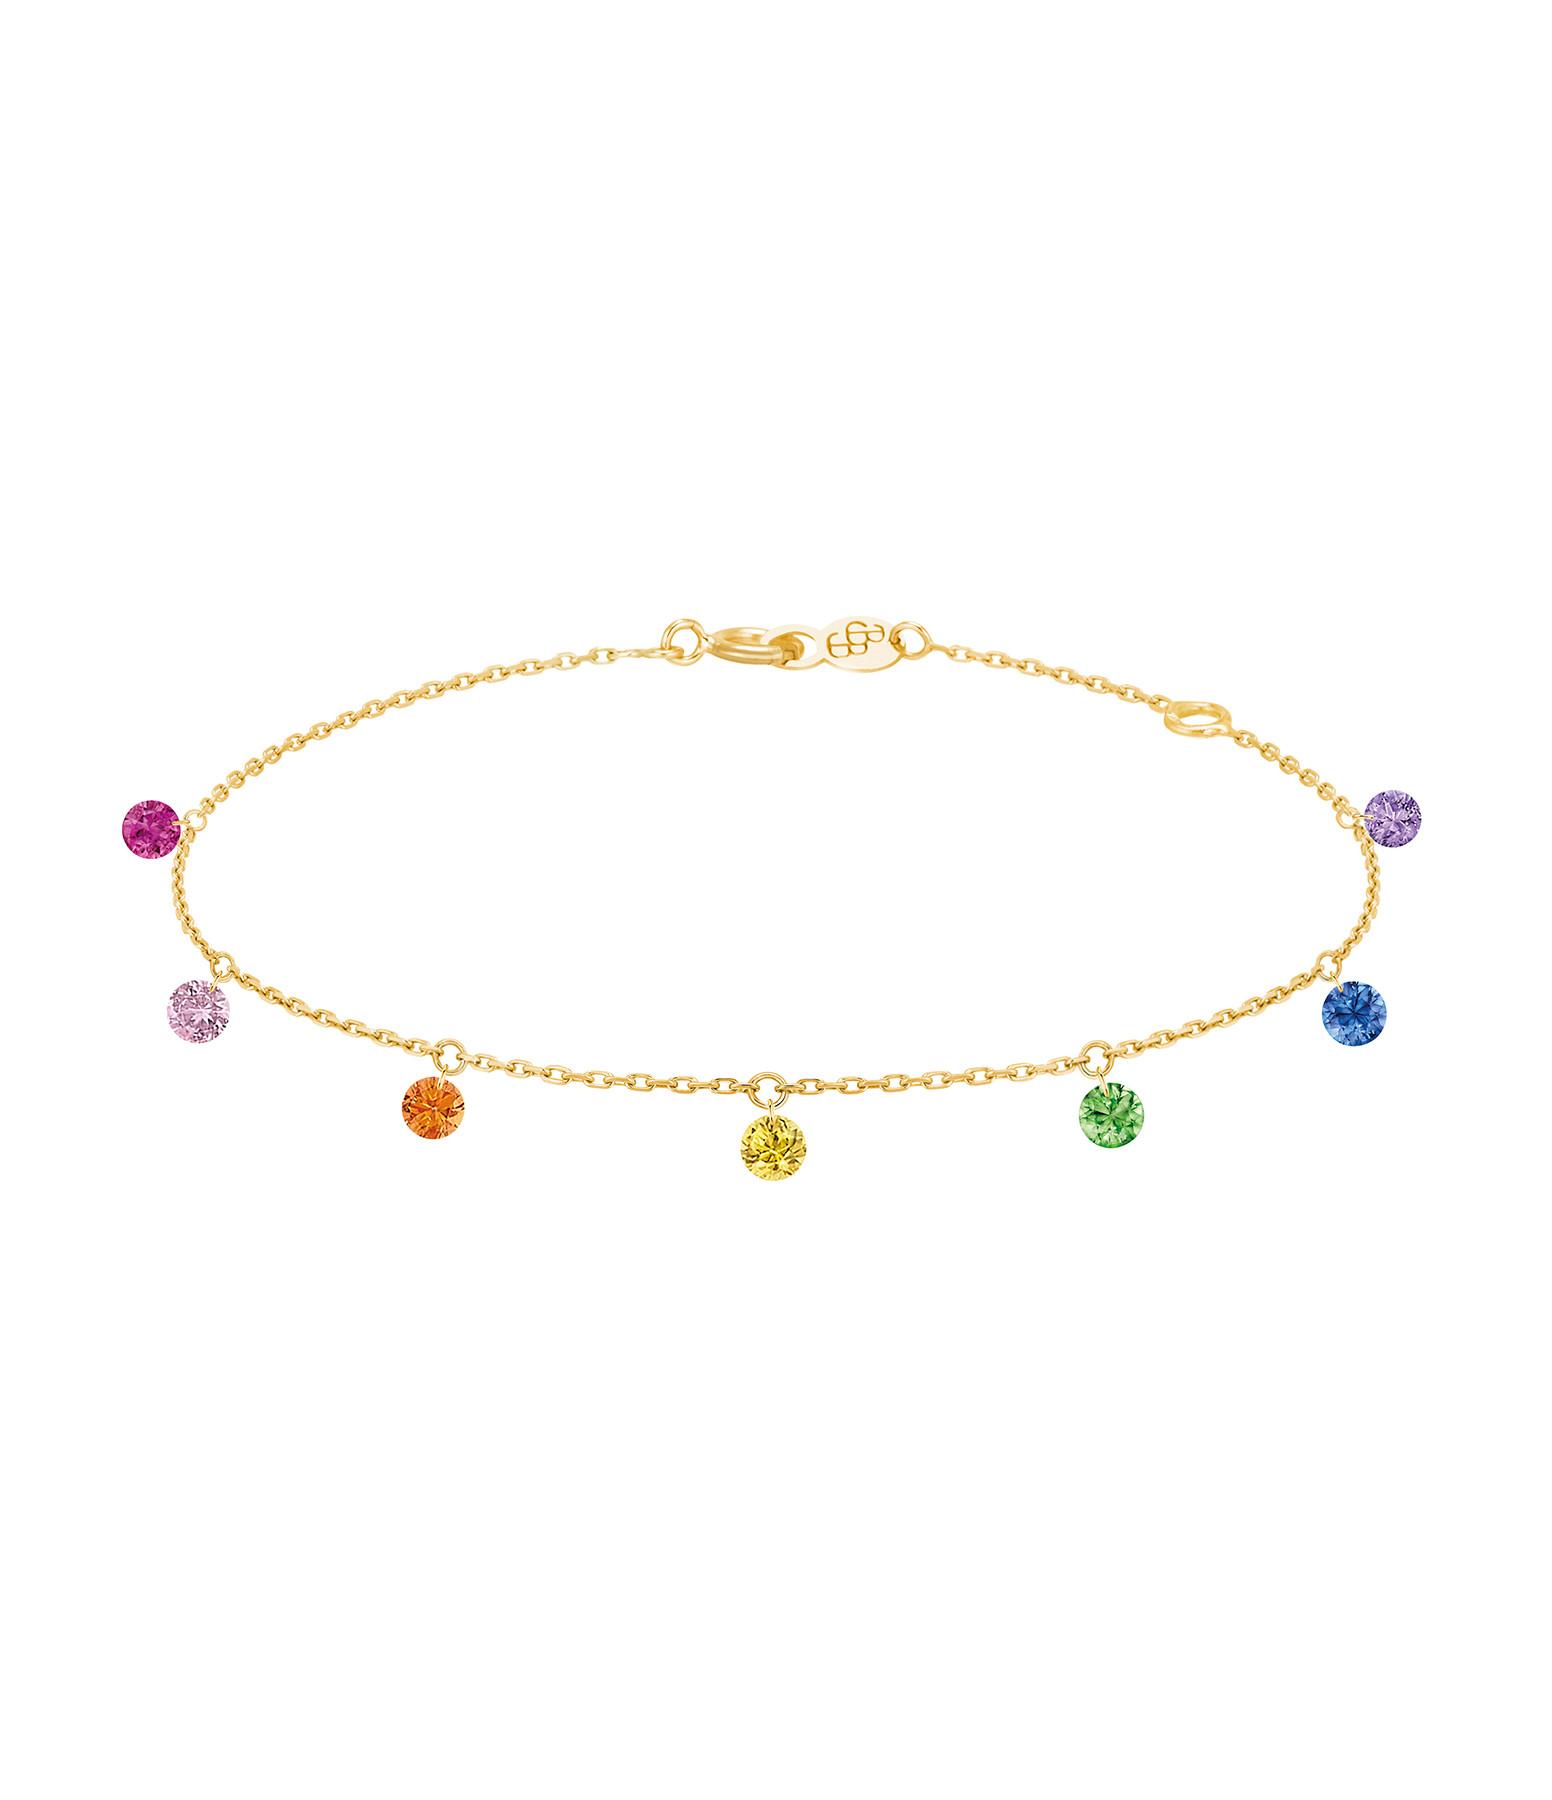 LA BRUNE & LA BLONDE - Bracelet Confetti 7 Rainbow Rubis Saphir Tsavorite Améthyste Or Jaune